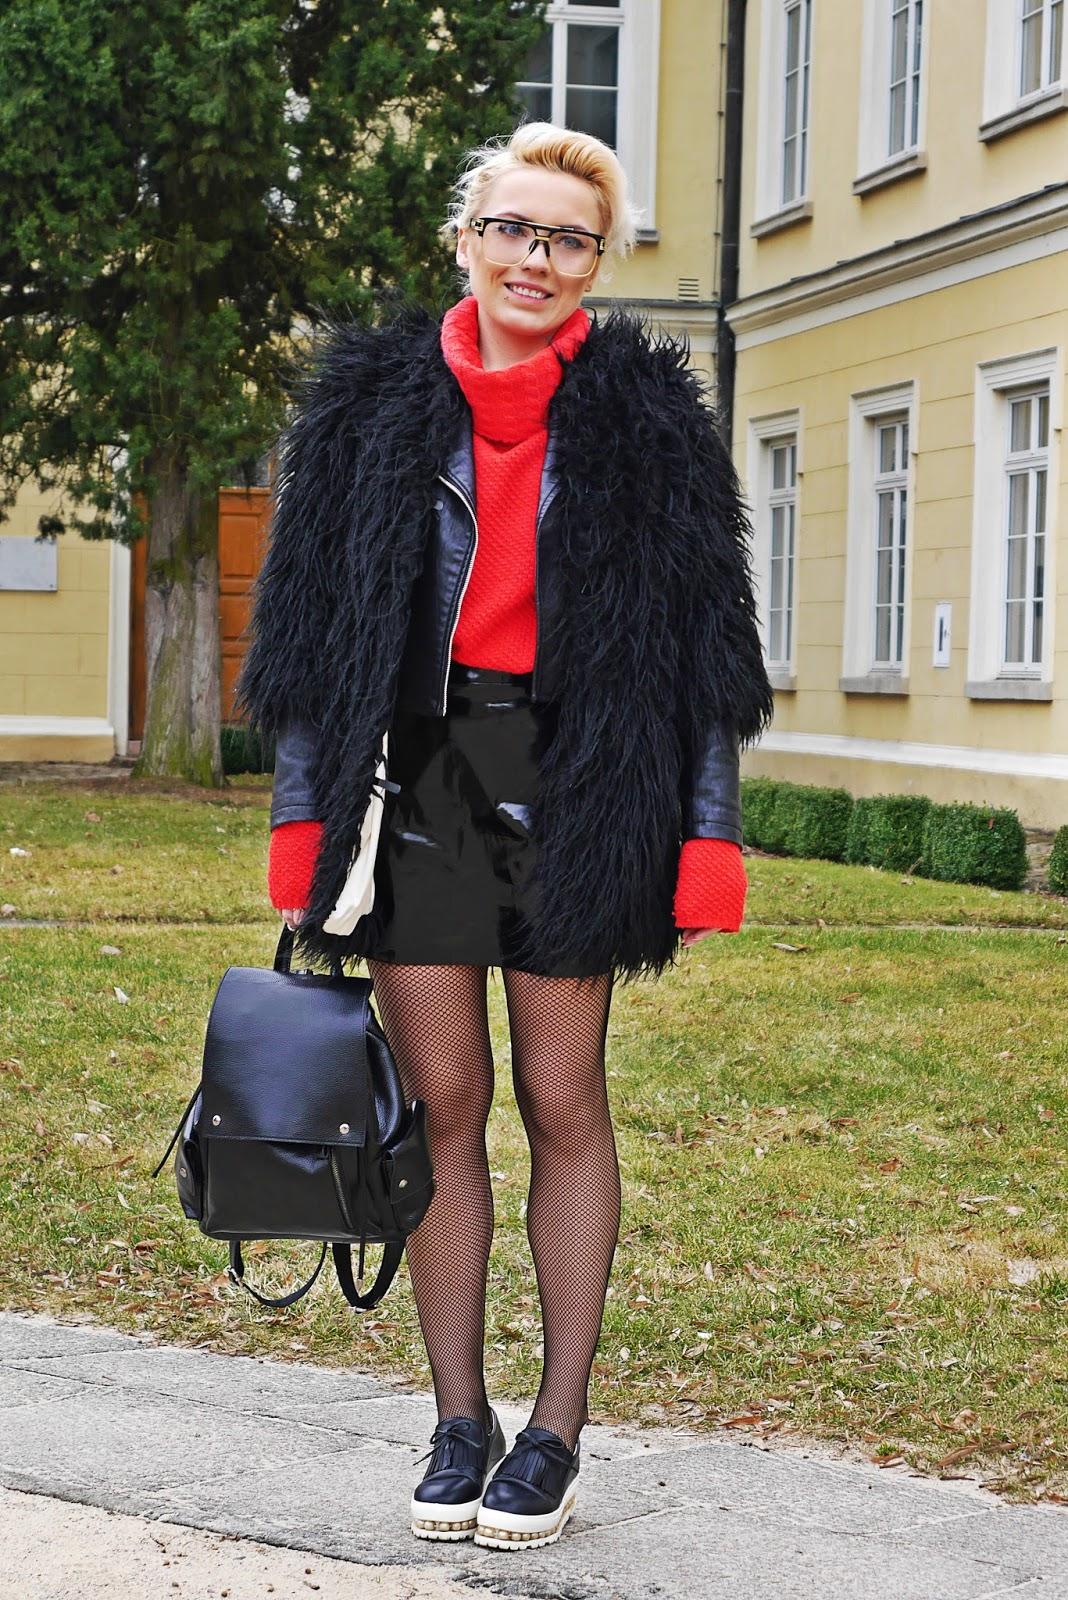 czarne_futerko_spodnica_cerata_look_karyn_blog_160317b